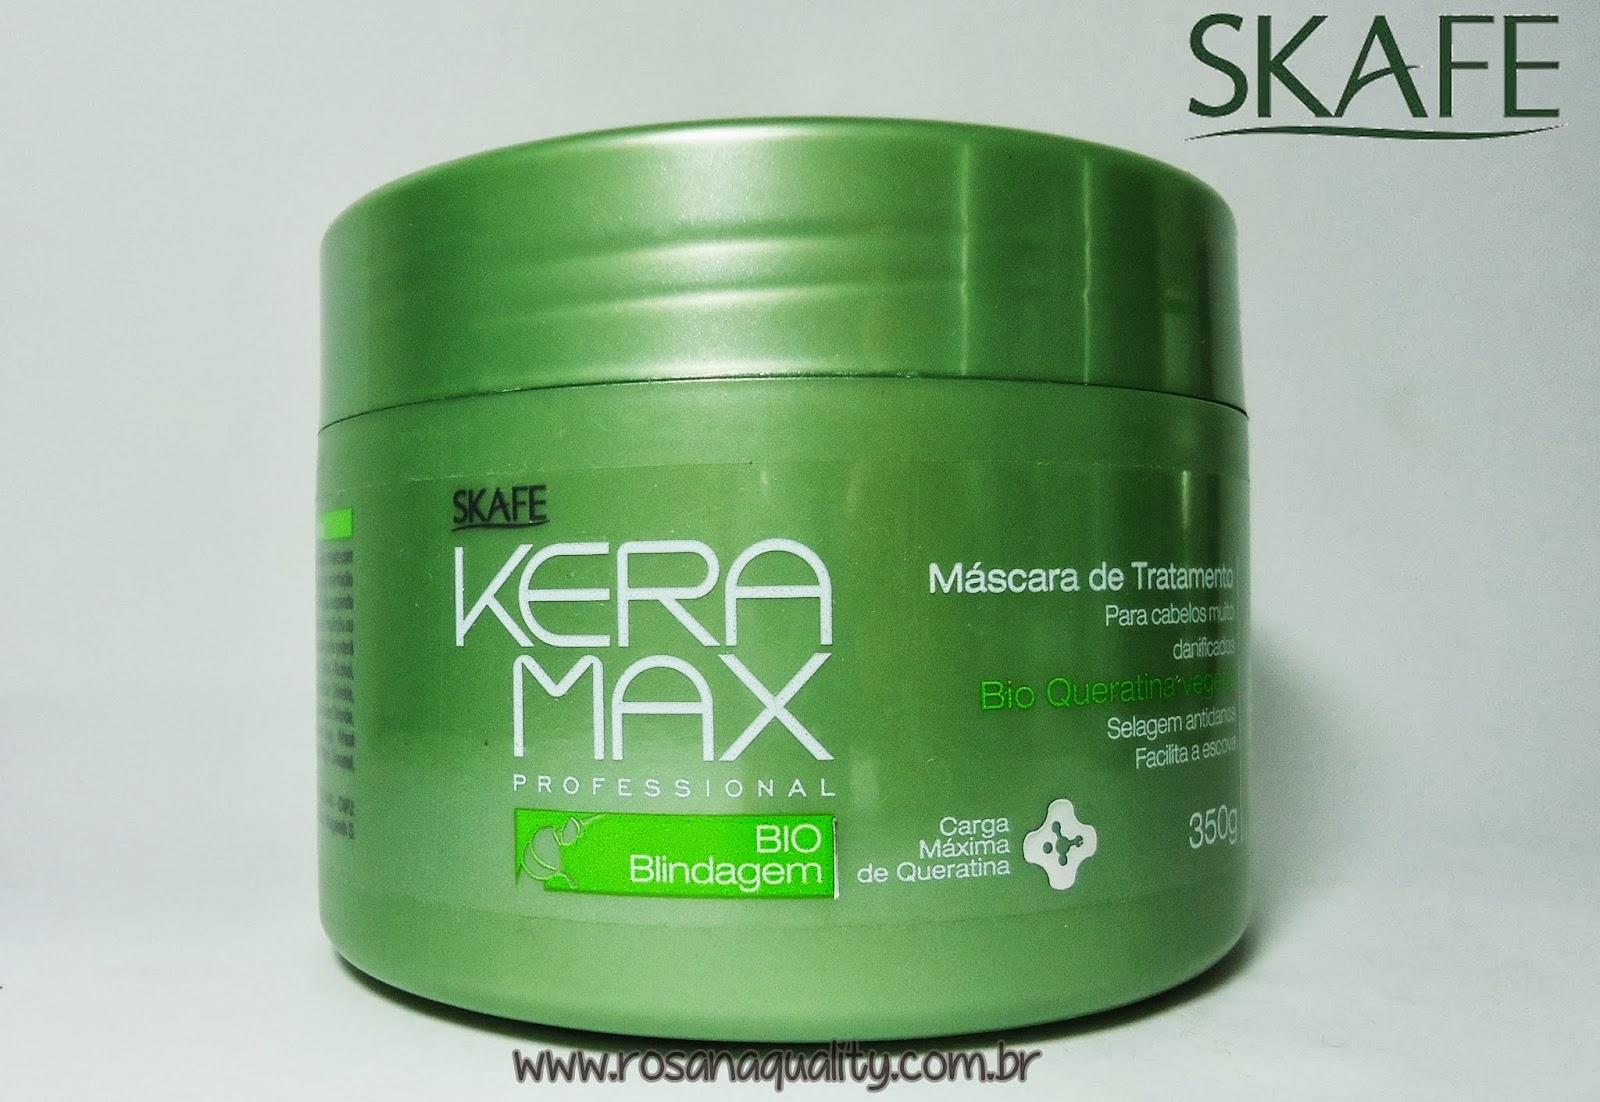 Keramax Bio Blindagem Skafe